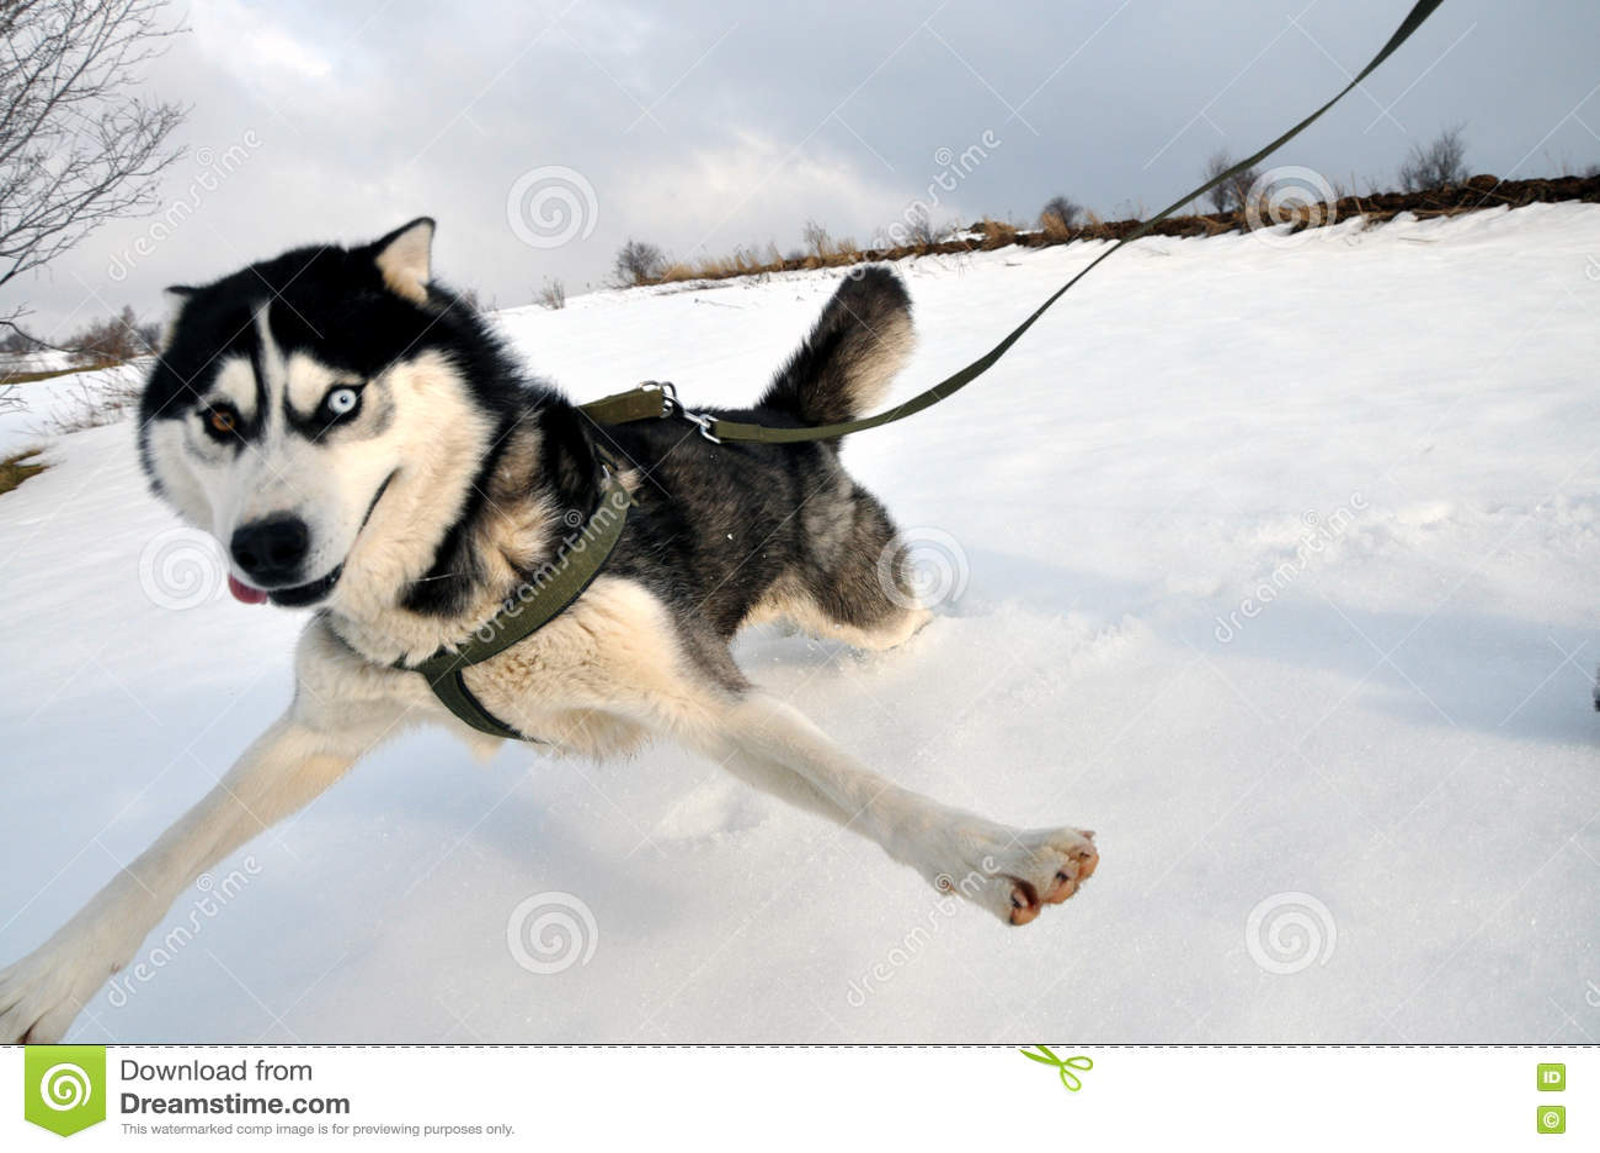 Selfie, Siberian husky dog perspective